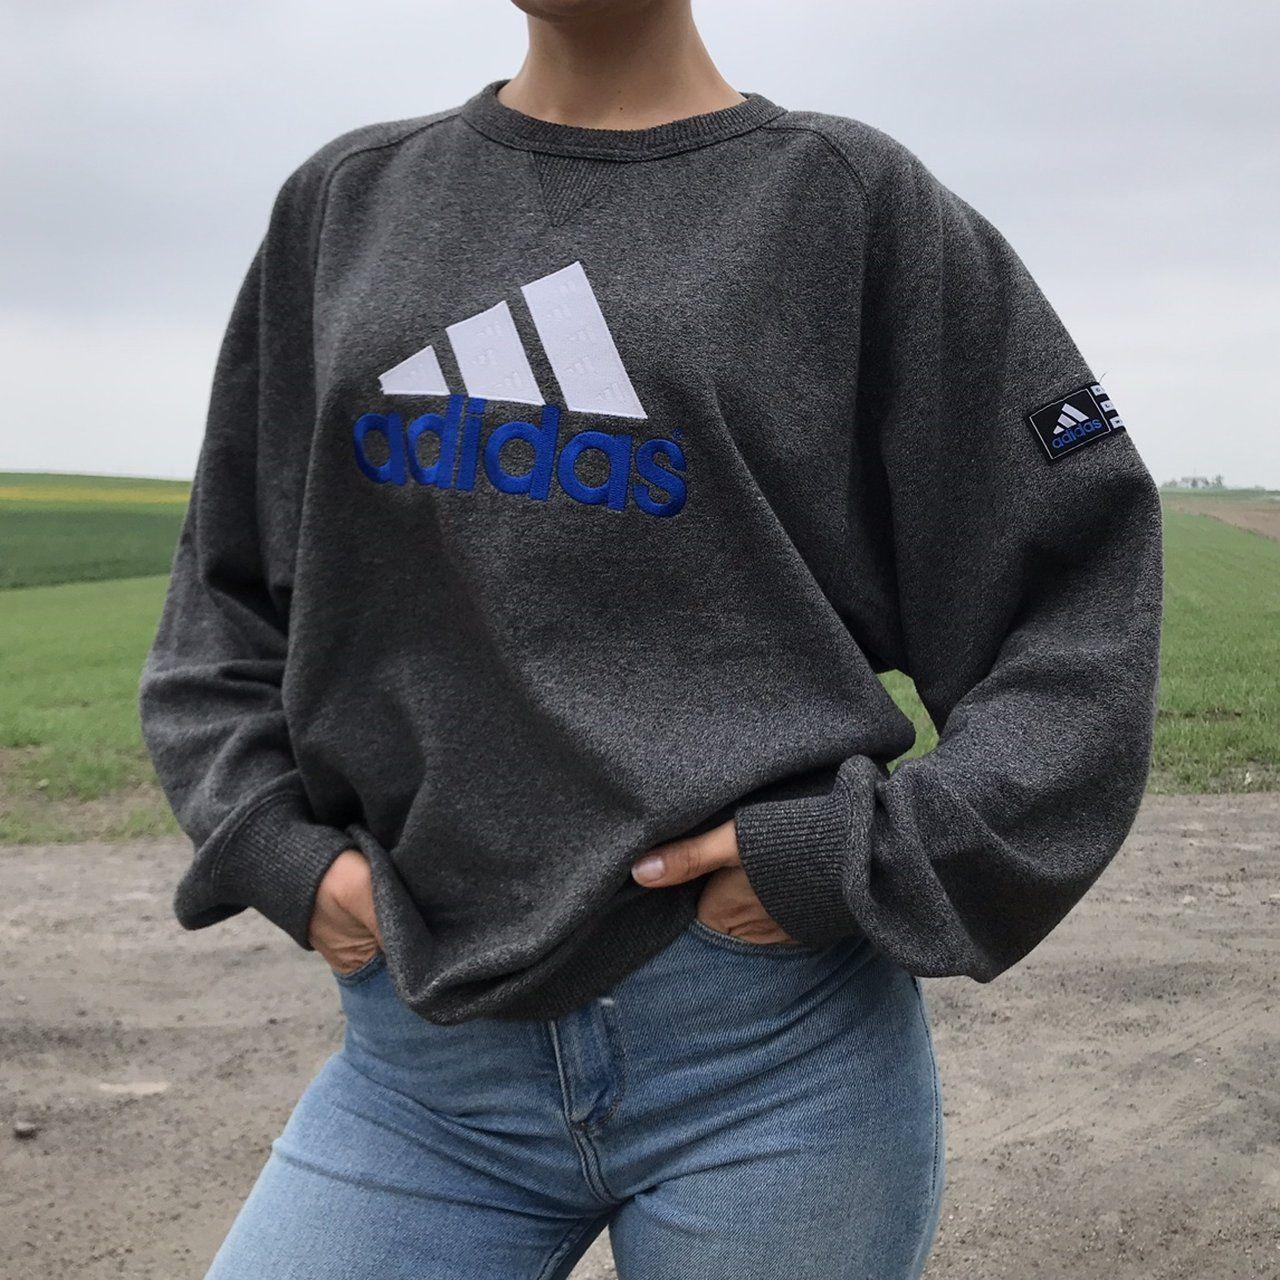 Vintage Adidas Sweatshirt 3 Stripes Size L 40 42 Gb Worn Depop Sweatshirts Vintage Adidas Sweatshirt Vintage Sweatshirt [ 1280 x 1280 Pixel ]